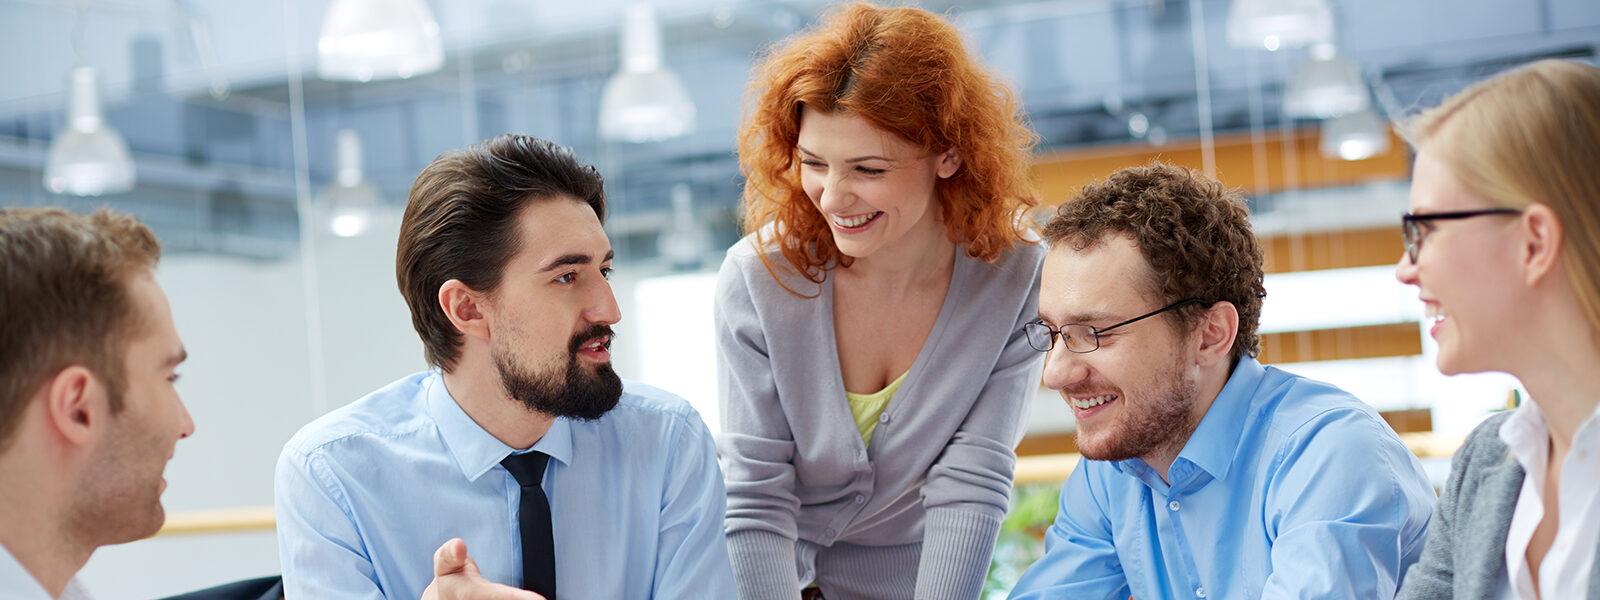 Building lasting relationships & delivering exceptional value